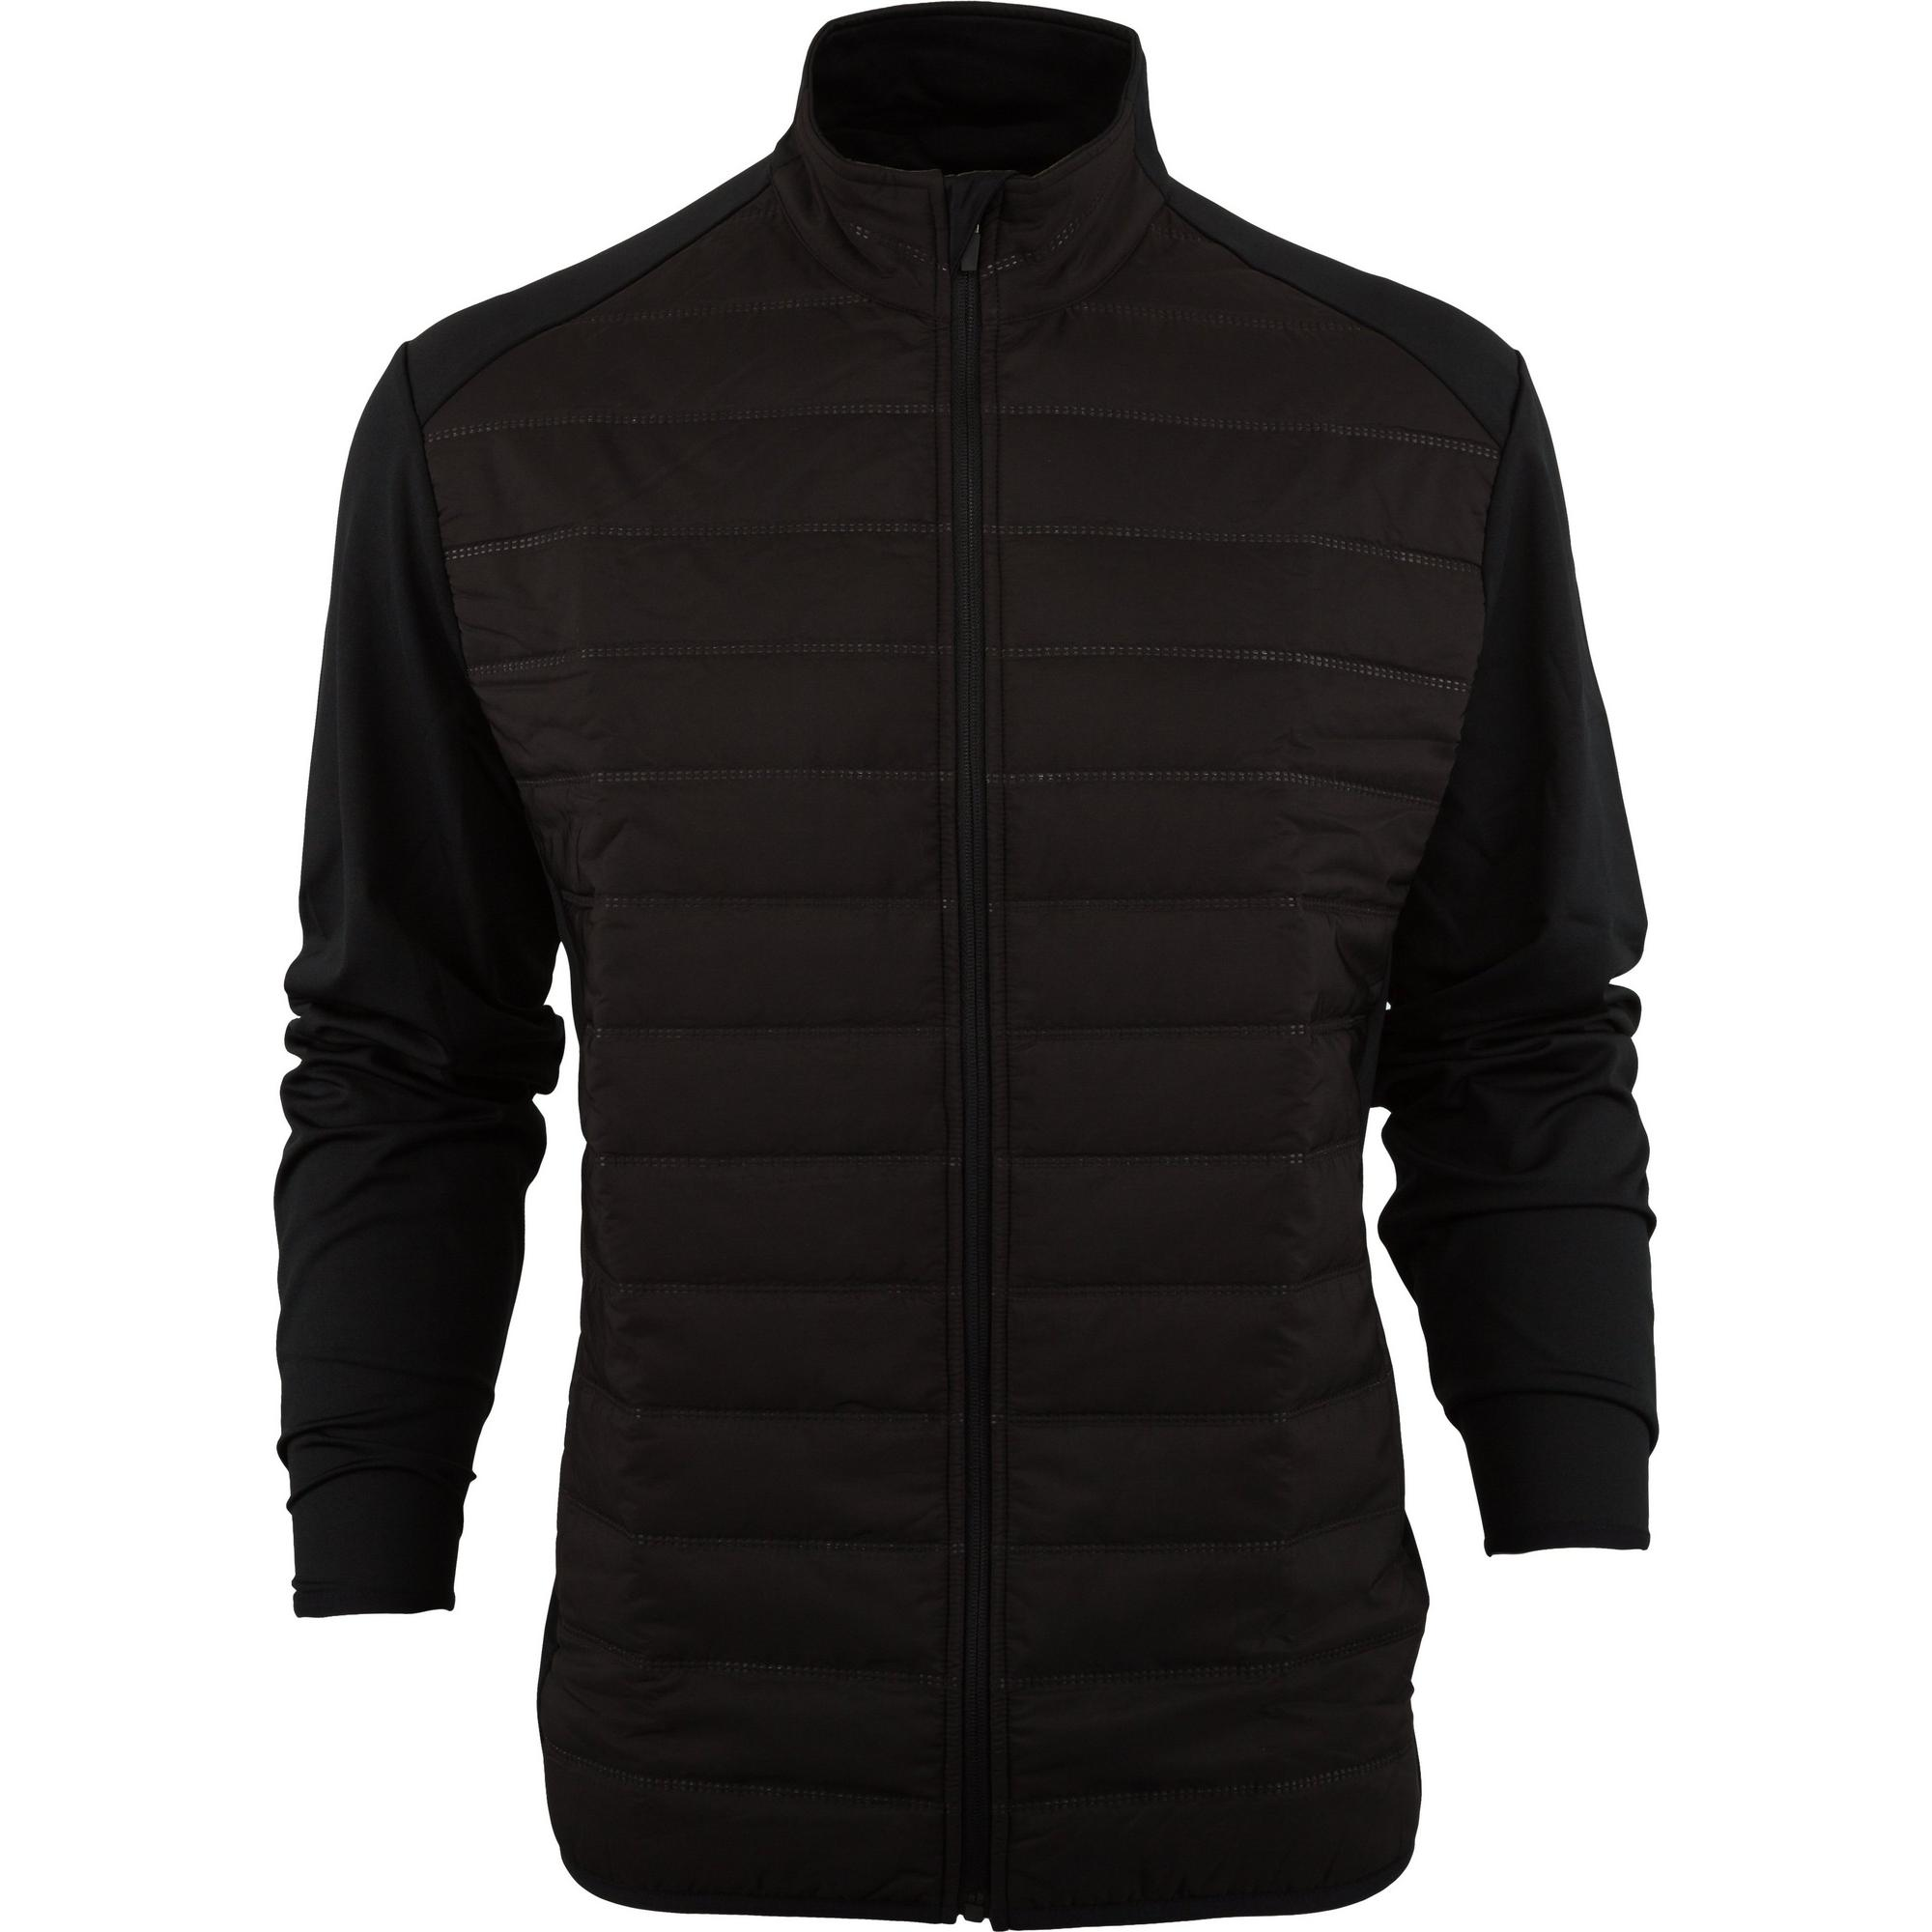 JACK NICKLAUS Men's Ultrasonic Quilted Full Zip Jacket